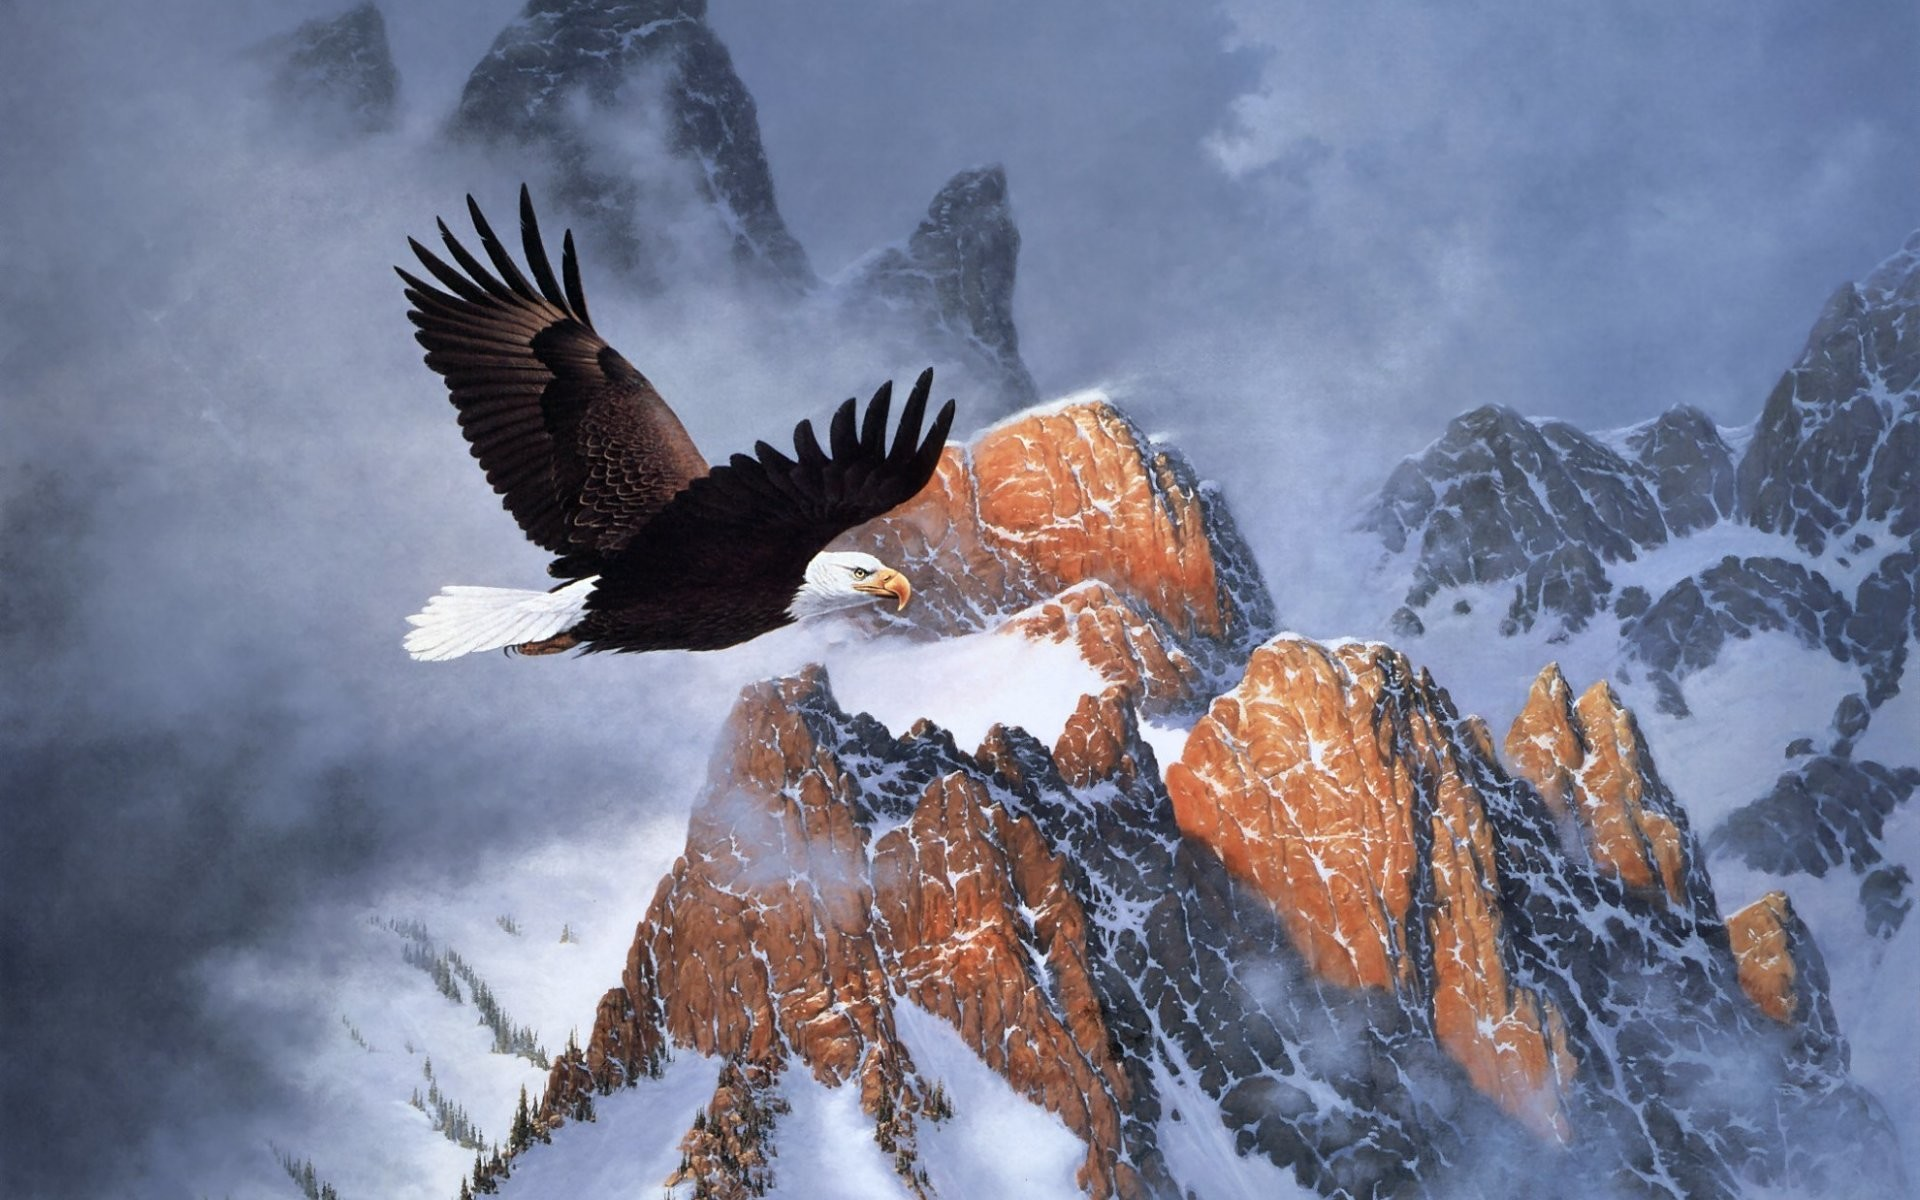 … eagles wallpapers for desktop pixelstalk net …